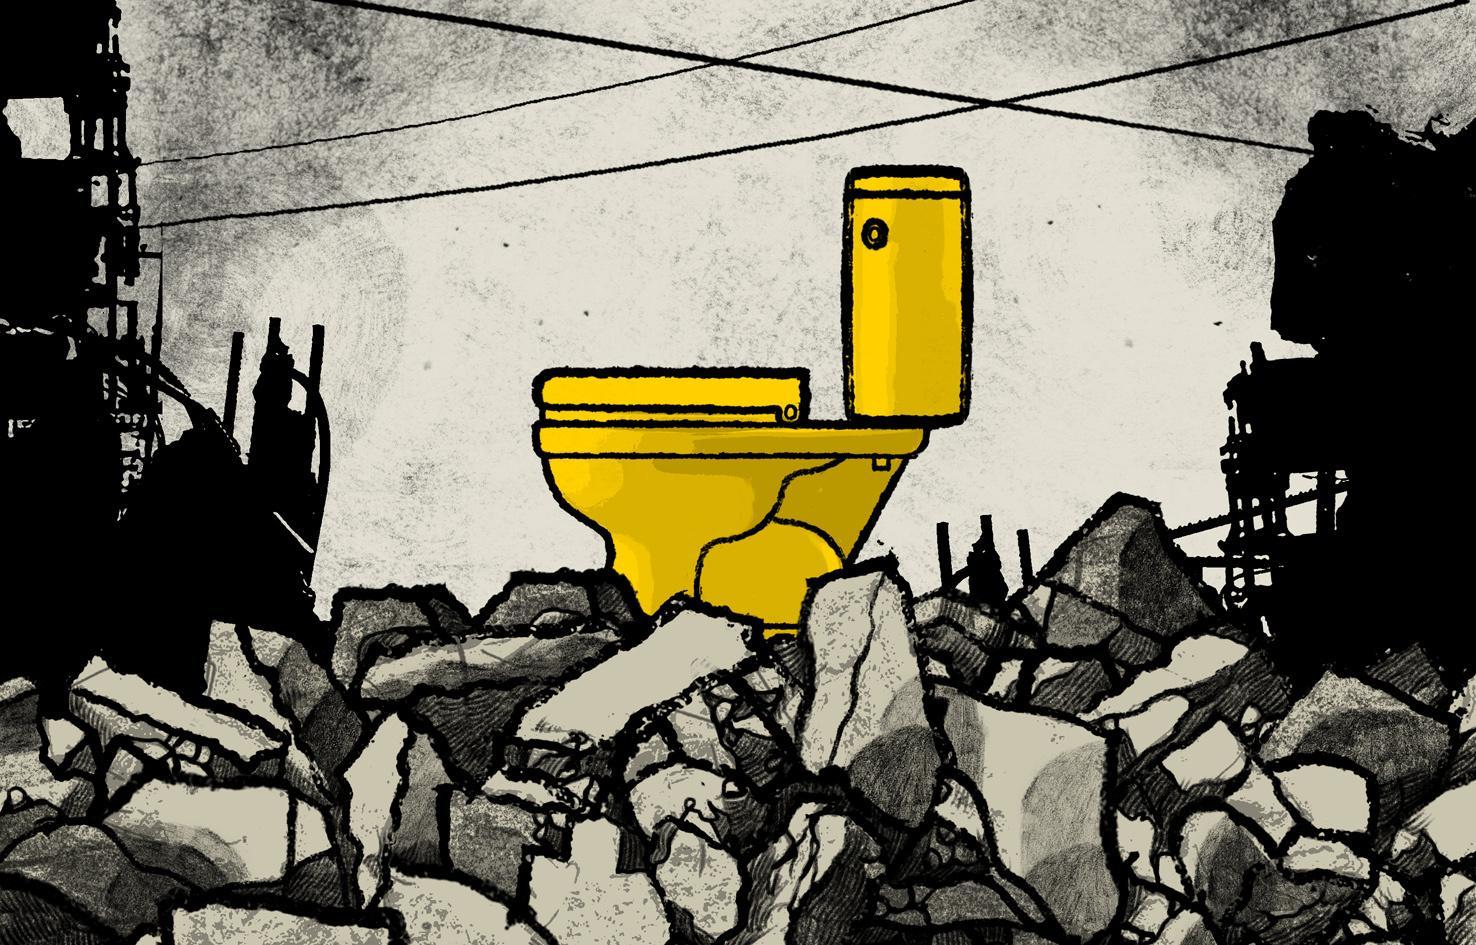 Golden toilets, golden arches. As for David Cameron...